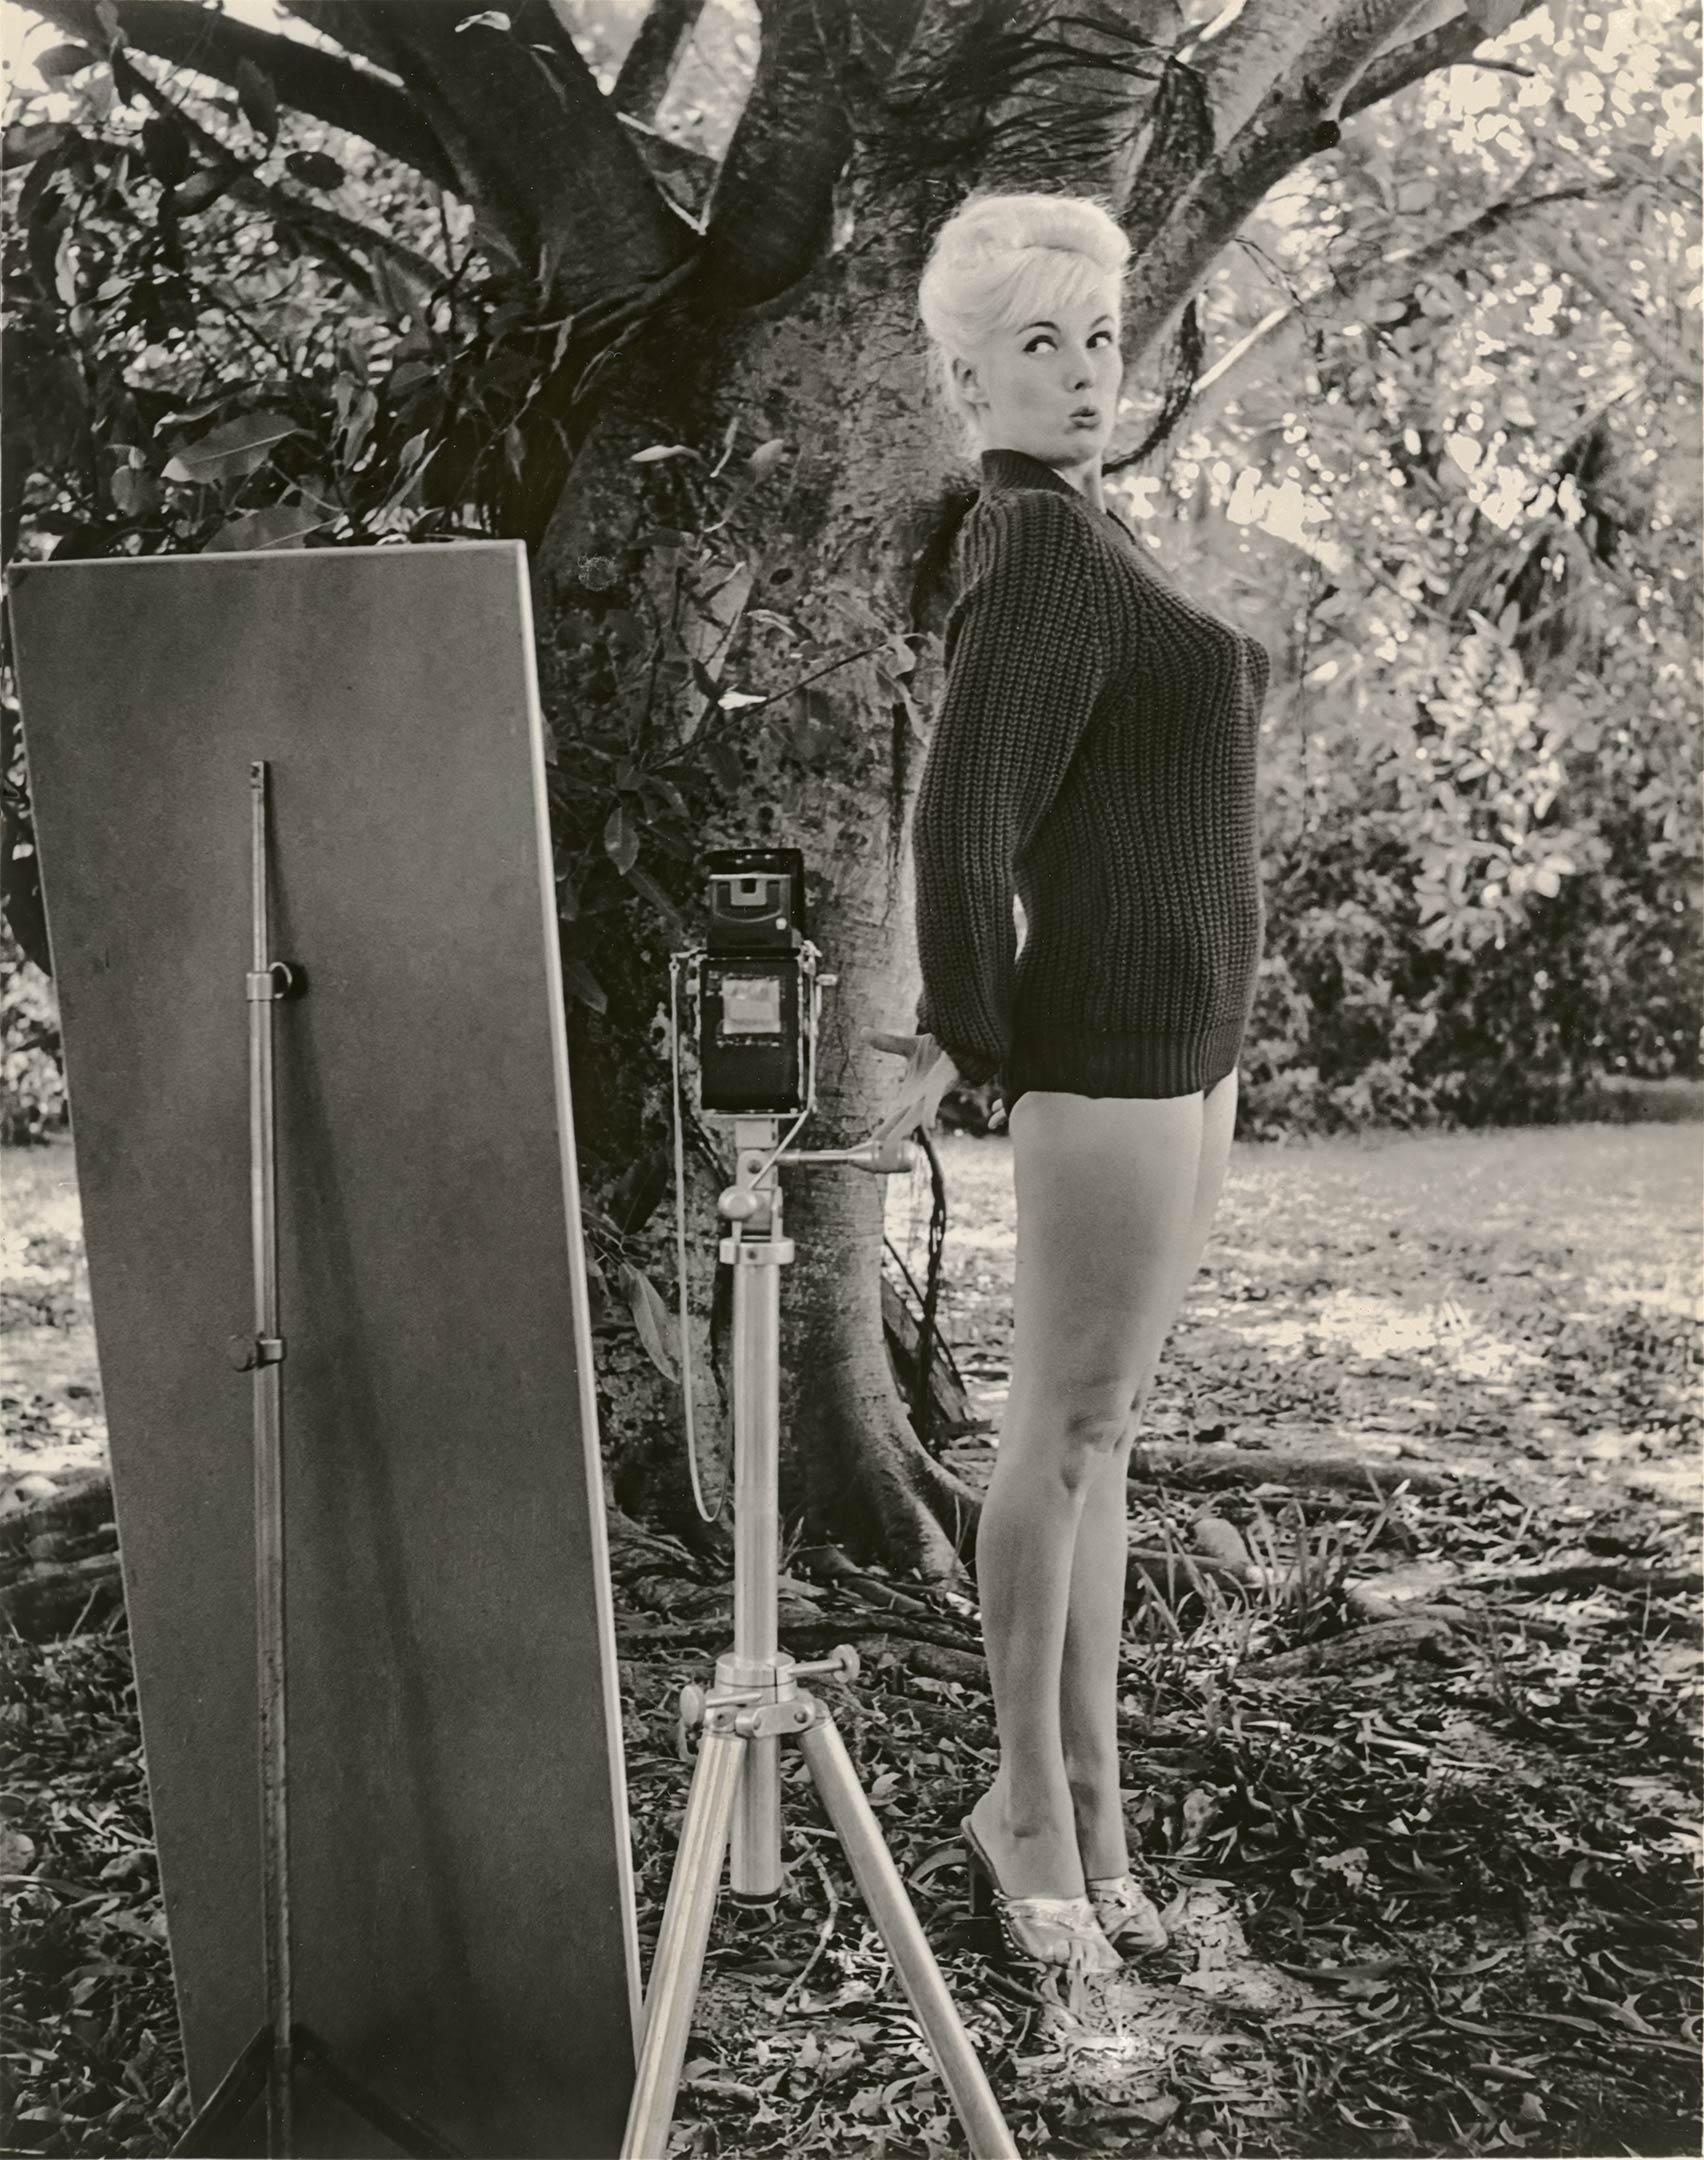 Bunny Yeager Self Portrait Backyard_How I Photograph Myself_web-1